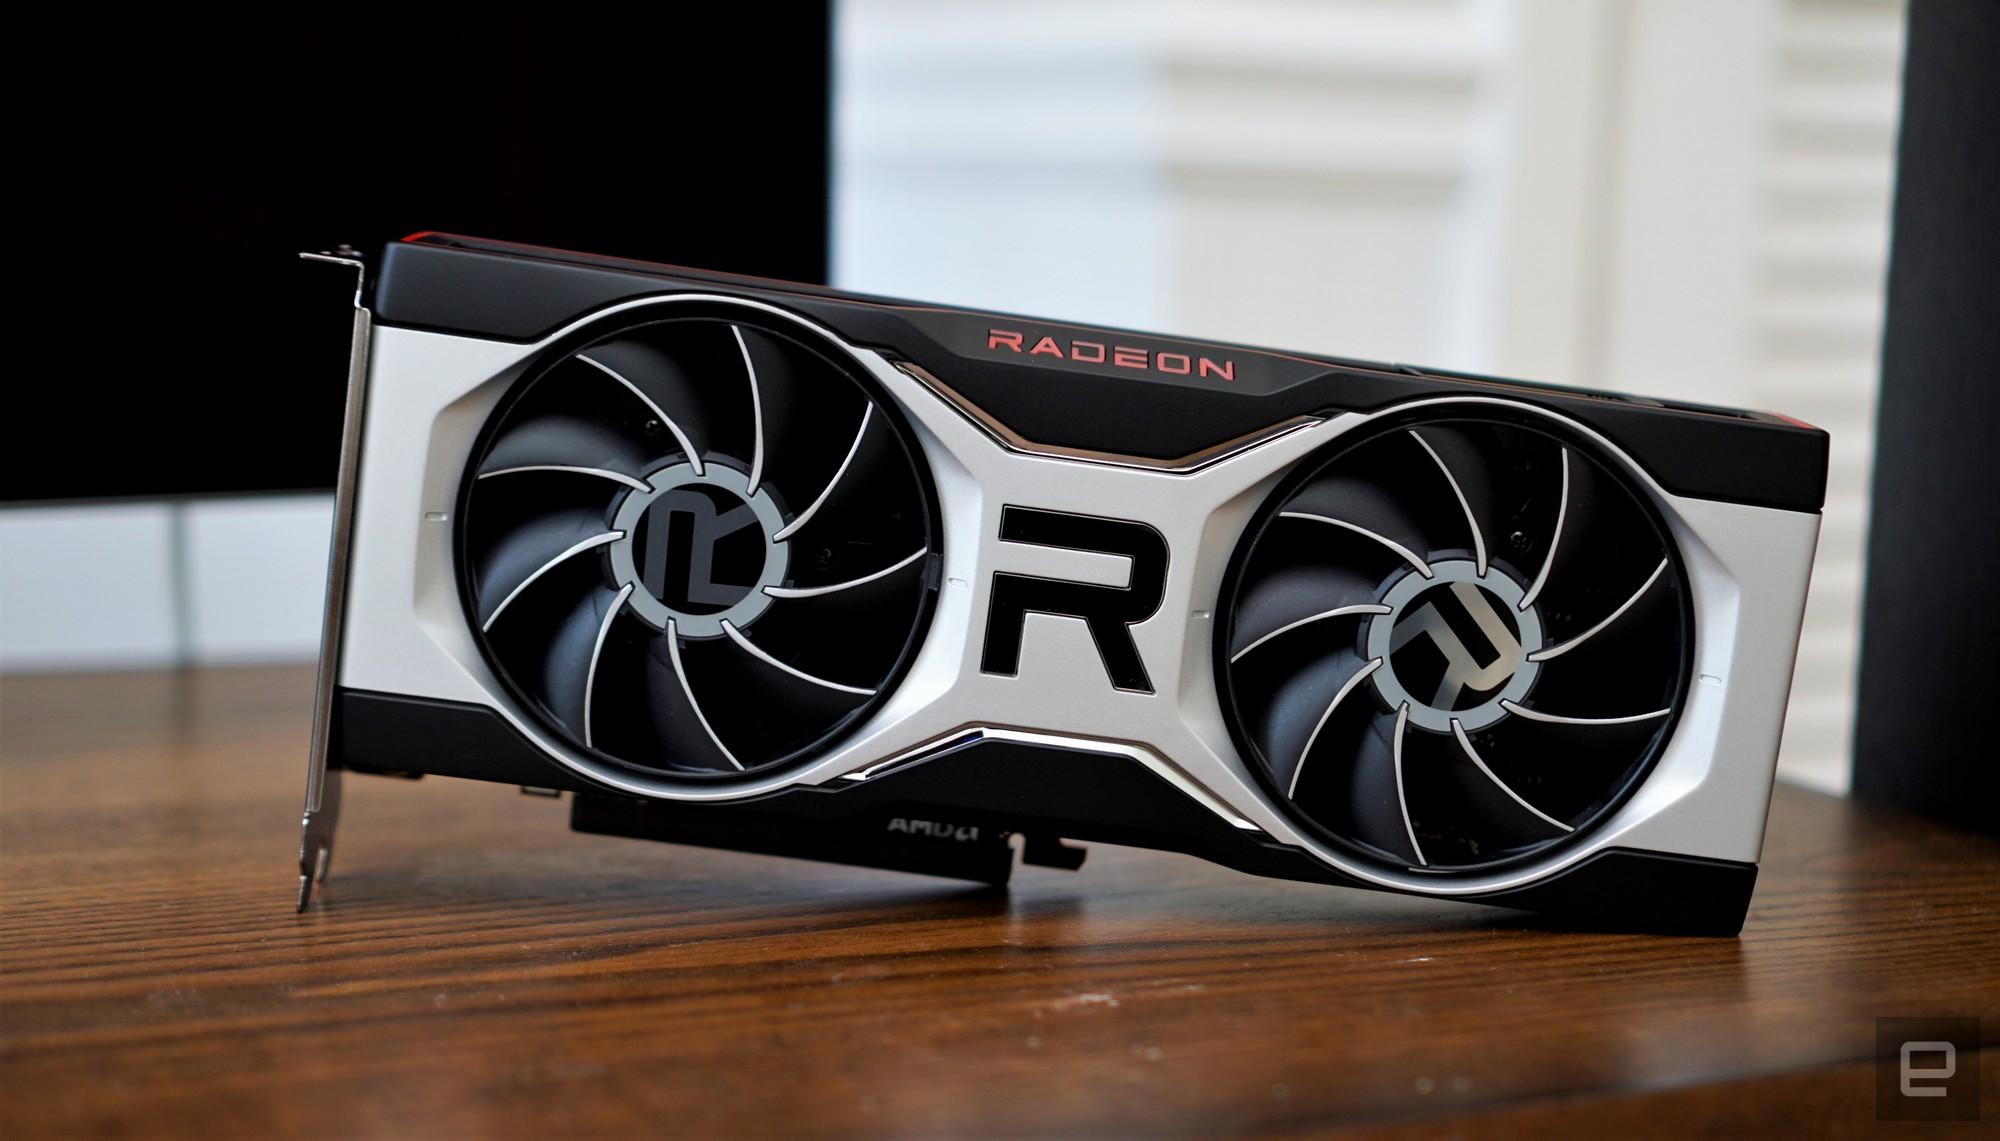 <p>AMD Radeon RX 6700 XT</p>